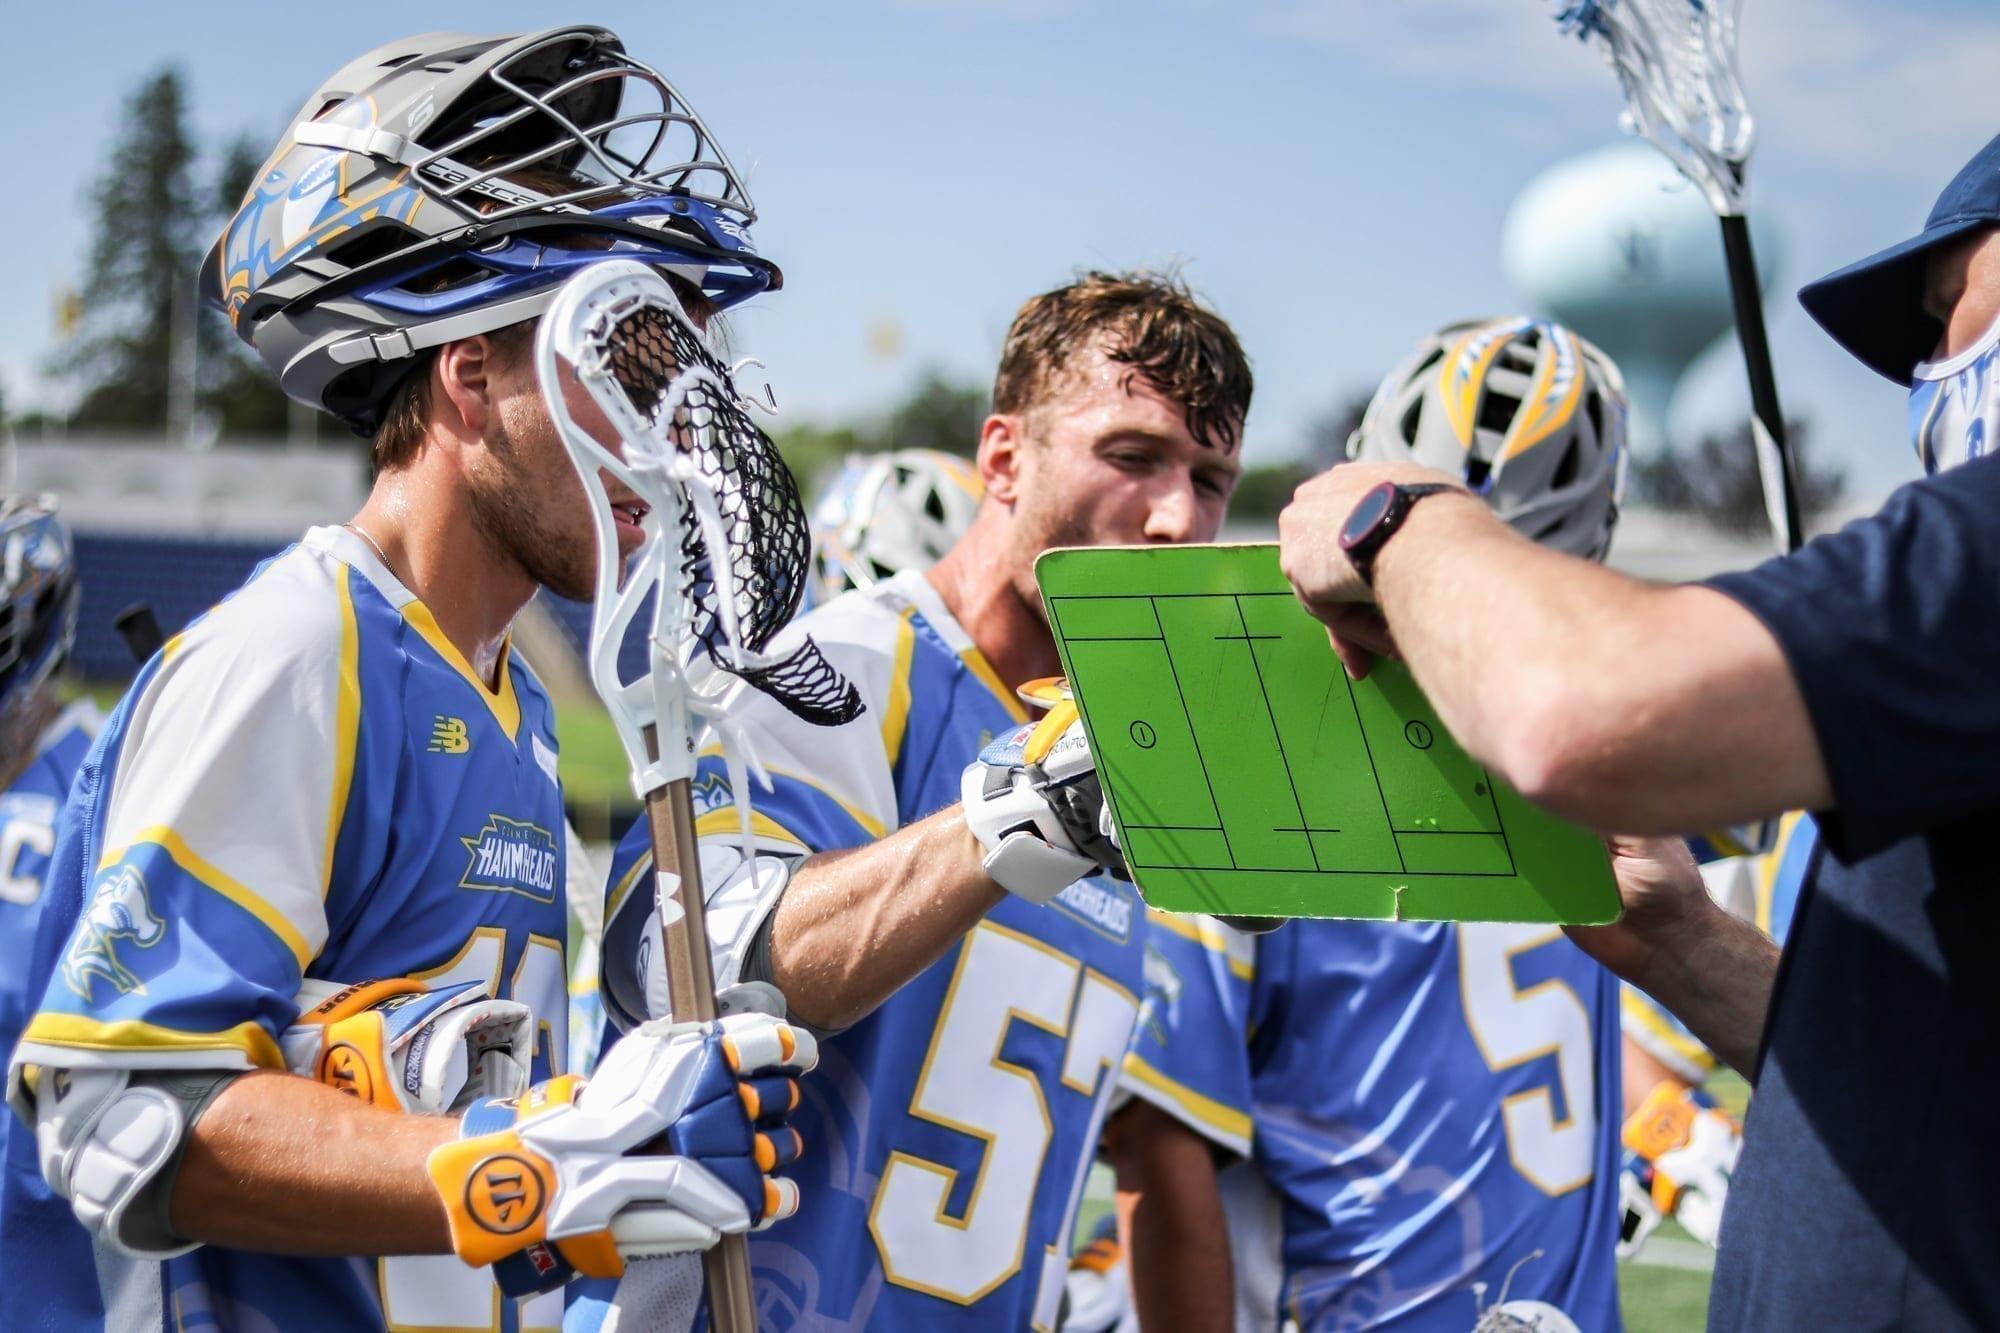 Connecticut Hammerheads Philadelphia Barrage 2020 Major League Lacrosse Pretty Instant-5